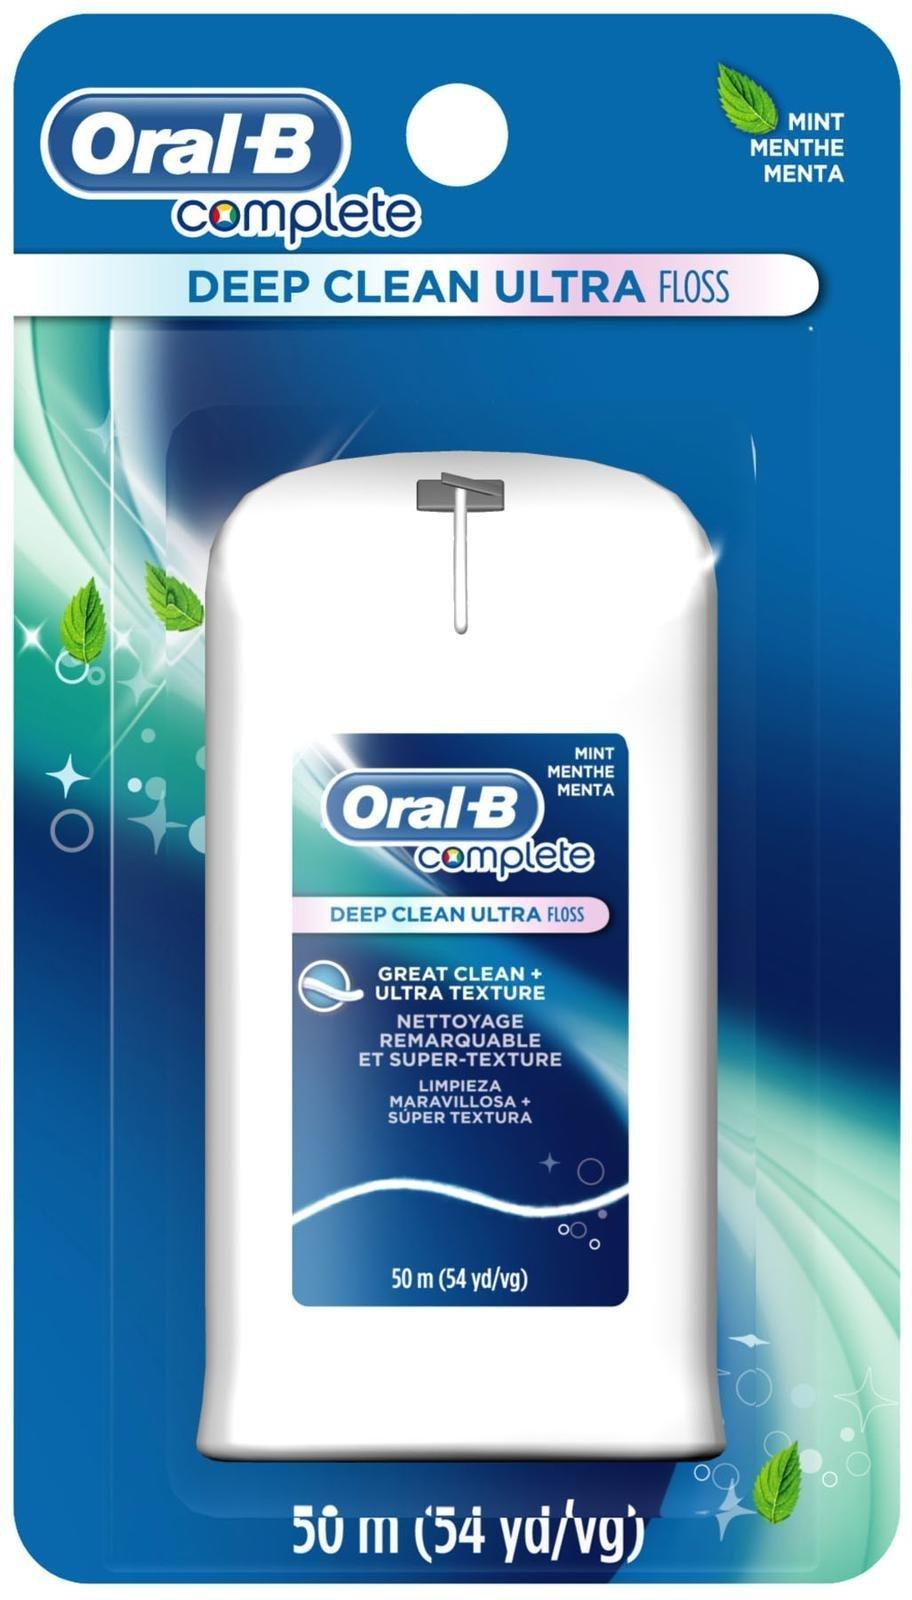 Oral-B Complete Deep Clean Ultra Floss, mint floss, 50m (54 yd/vg)